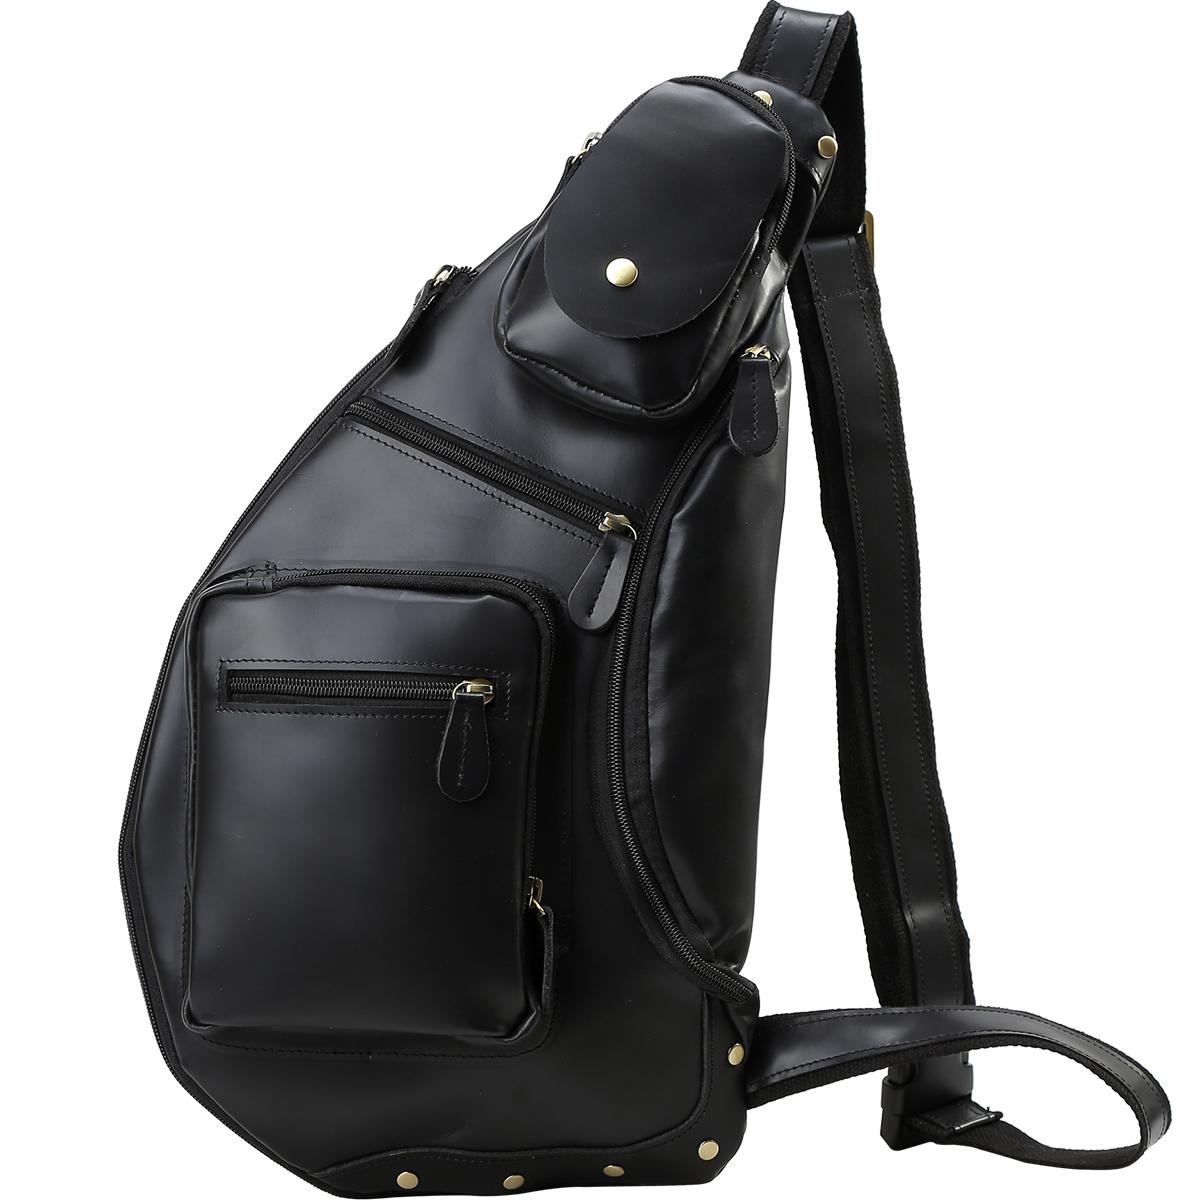 TIDING 潮牛 光沢感 本革 メンズ ボディバッグ ワンショルダーバッグ iPad 大容量 斜め掛けバッグ ボディーバッグ 革 レザー 牛革 自転車 タウン カジュアル バッグ 鞄 黒 ブラック D-MF MNFA_DL SBFA_DL